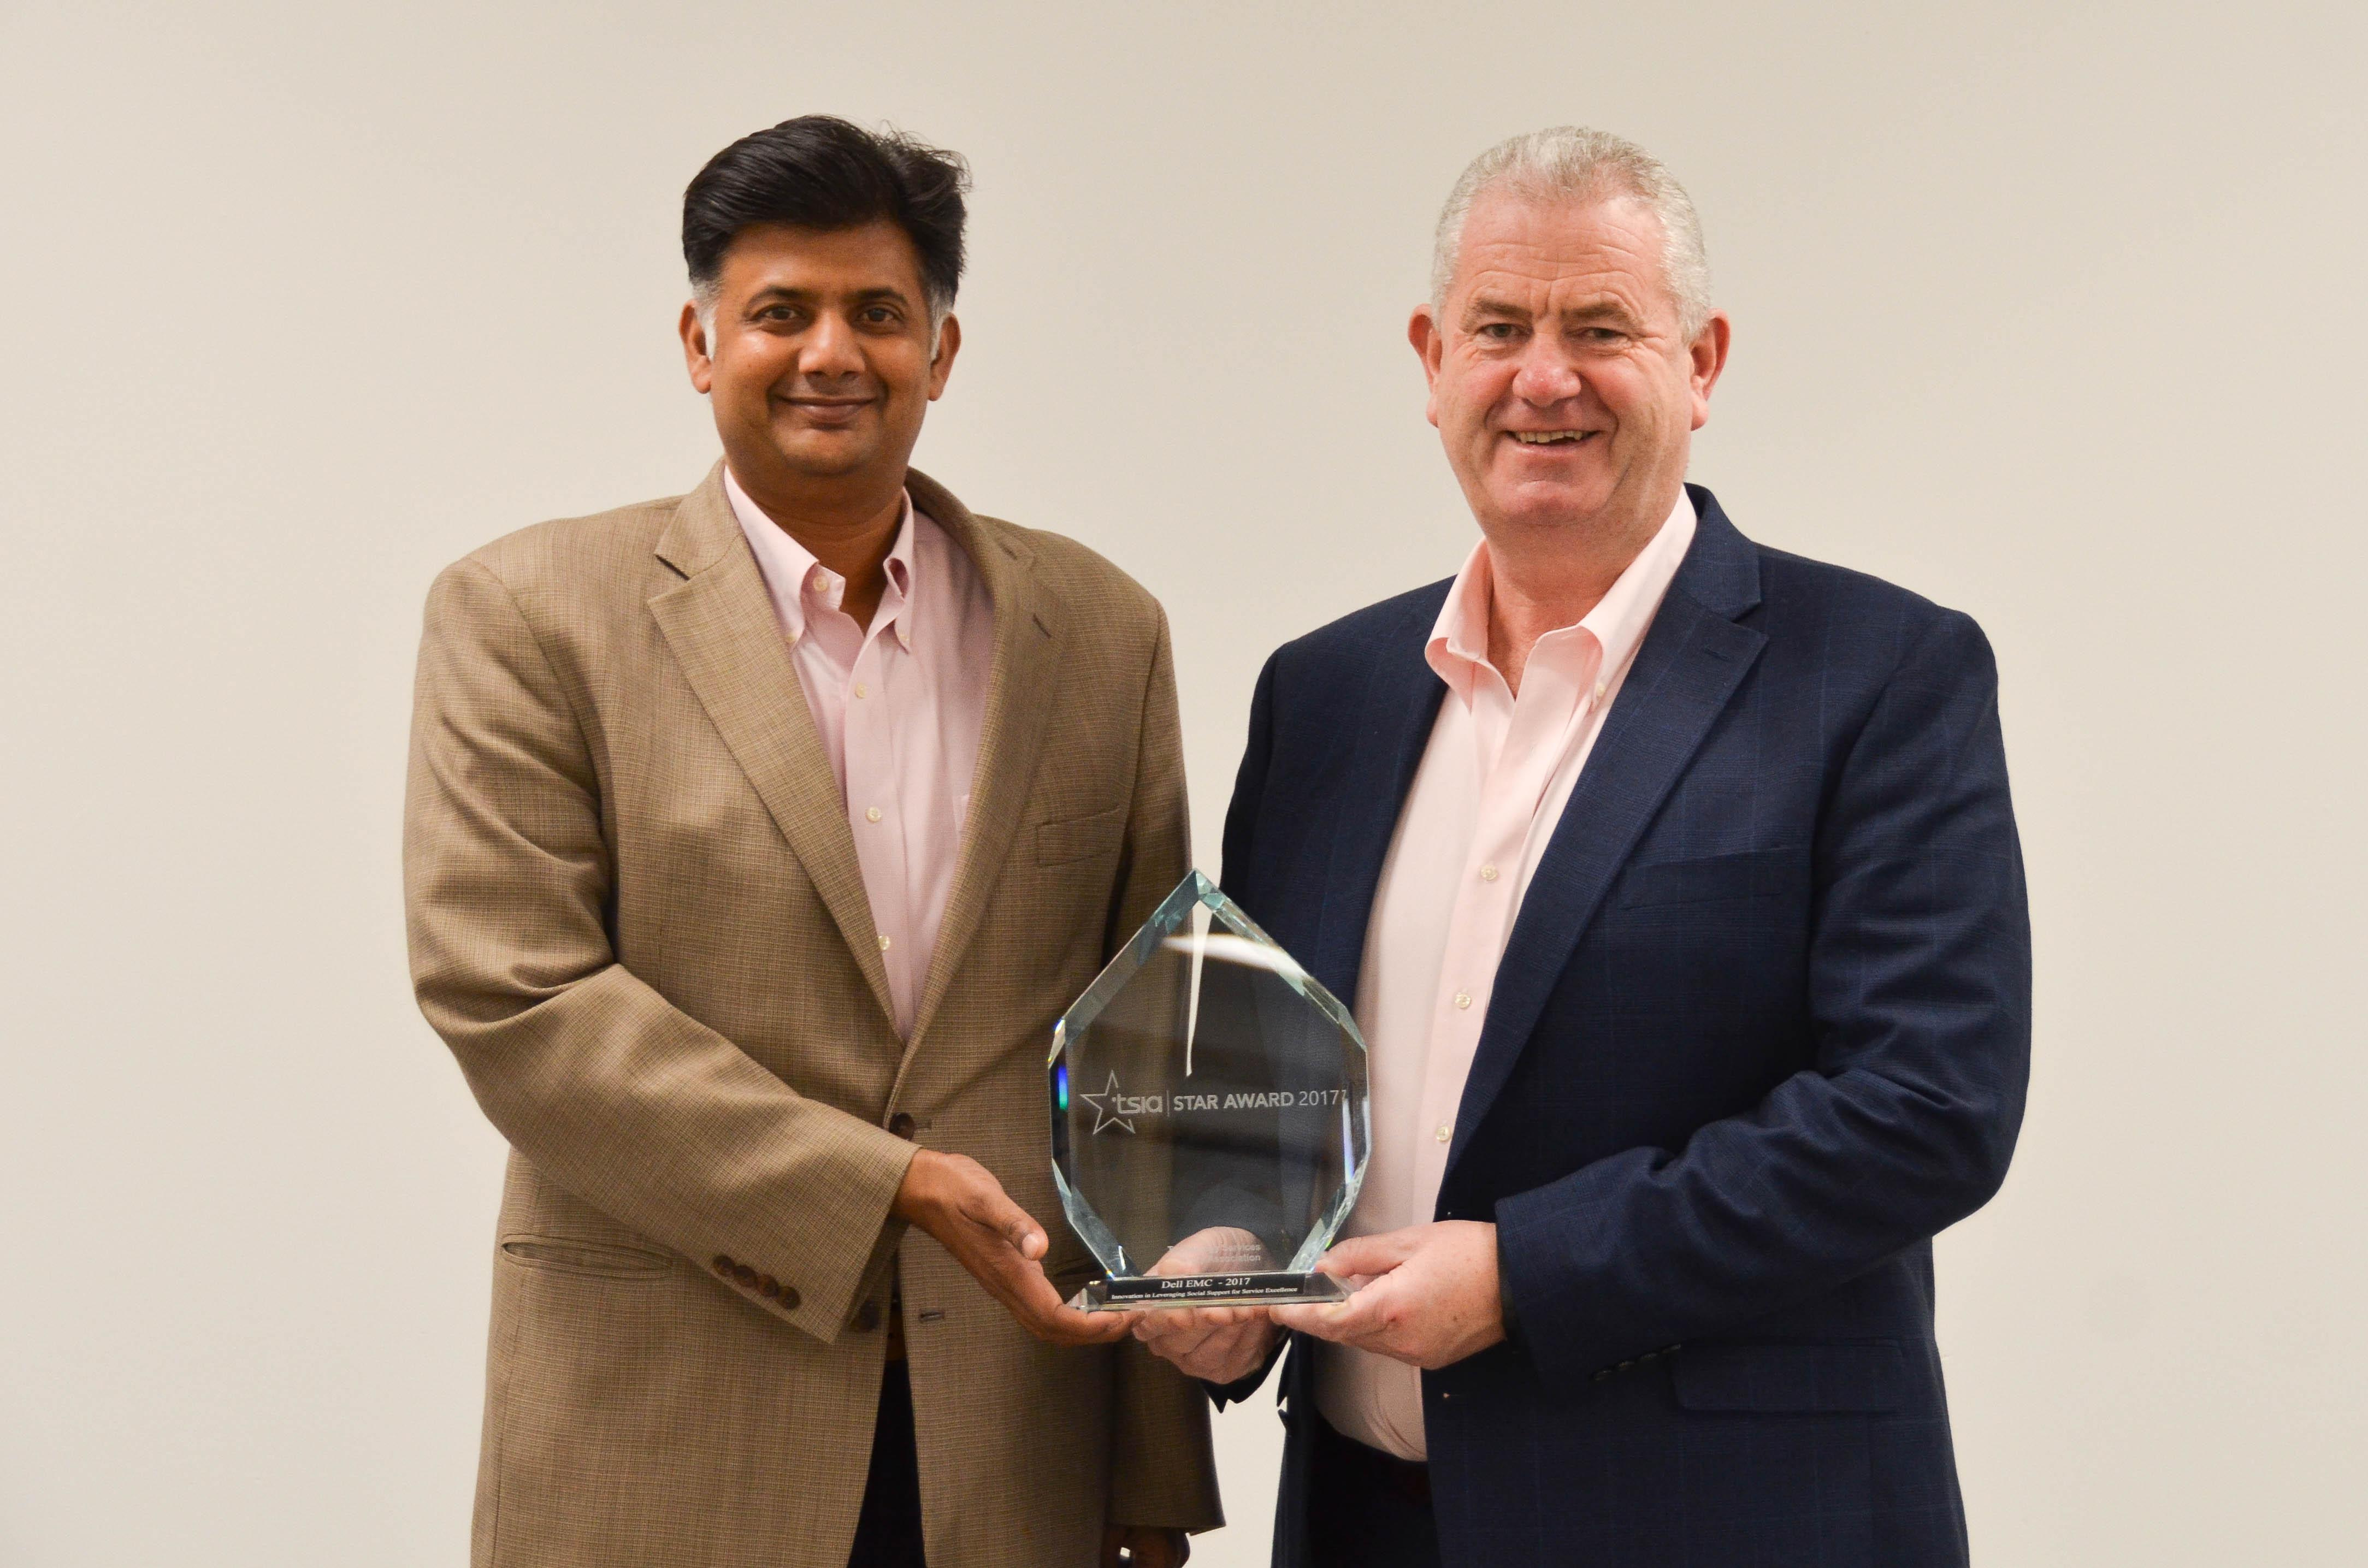 TSIA award